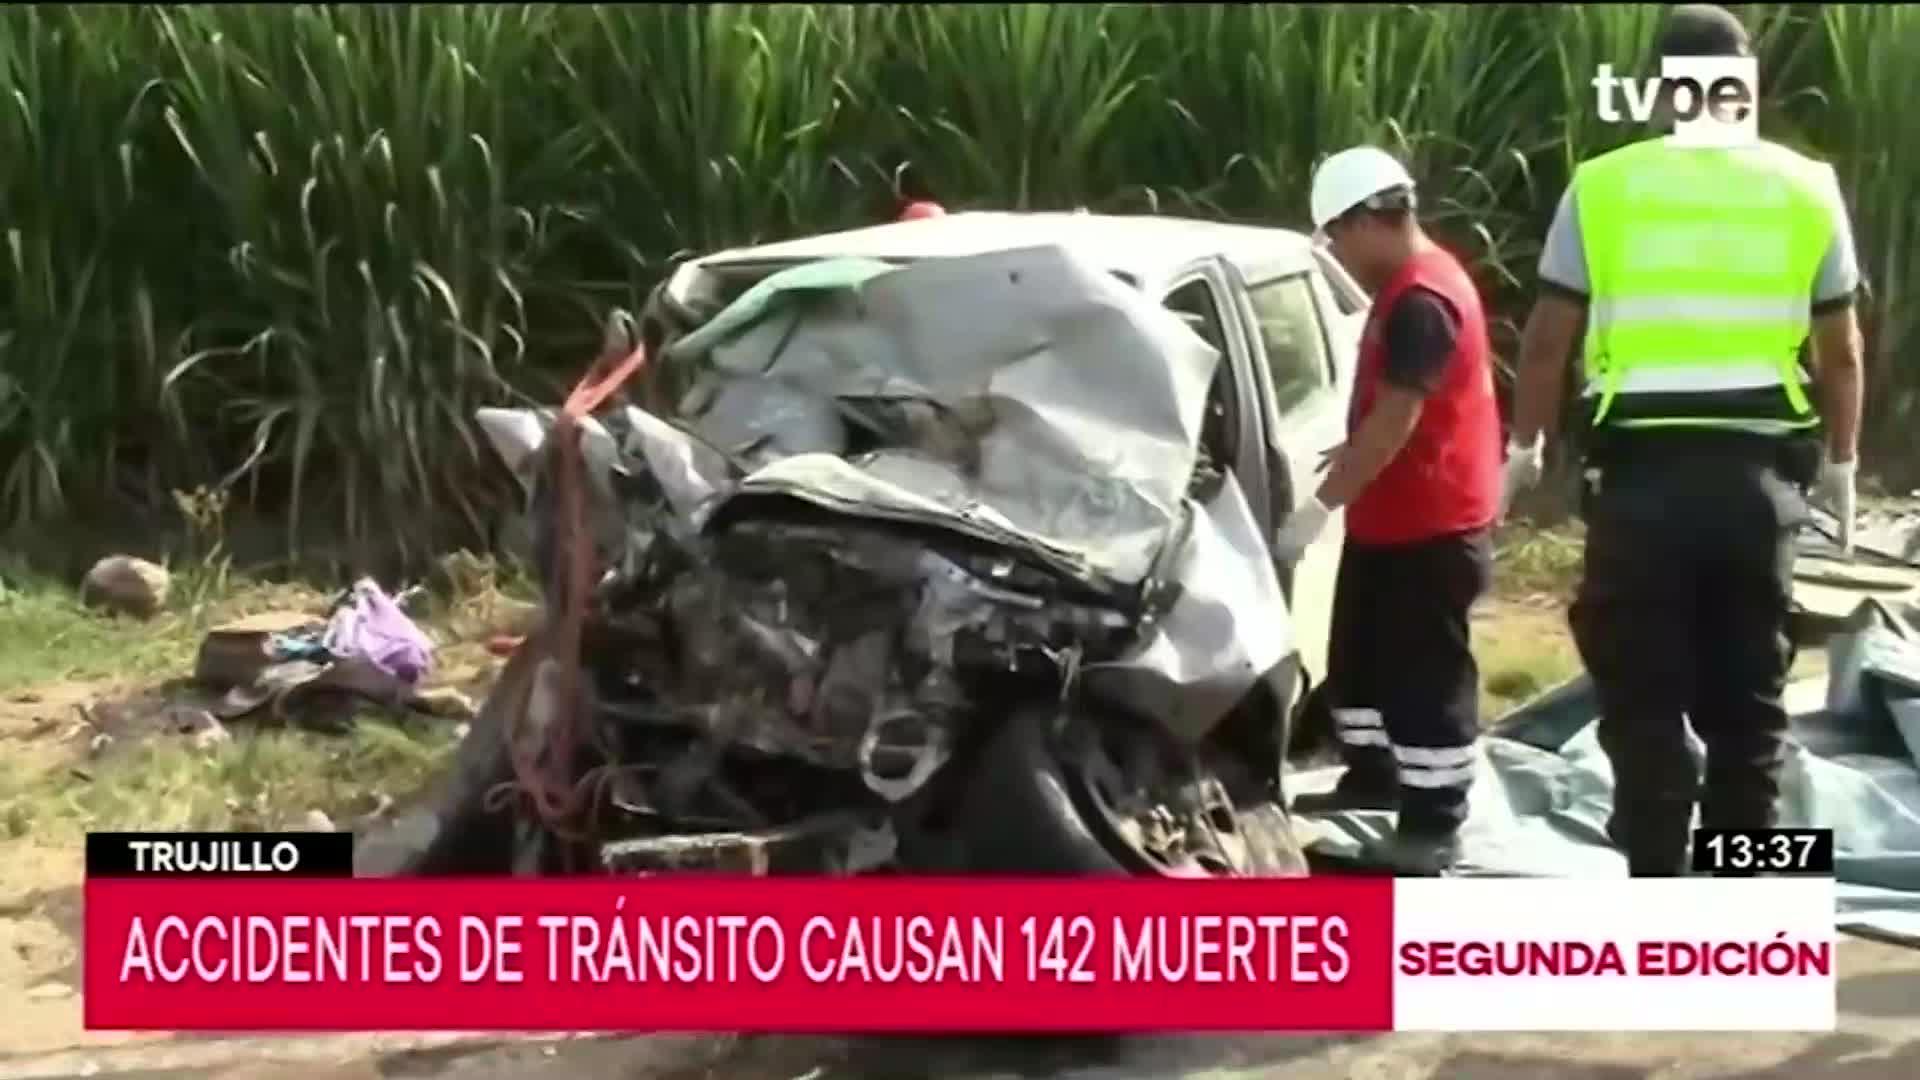 Accidentes de tránsito en Trujillo alcanzan cifras alarmantes